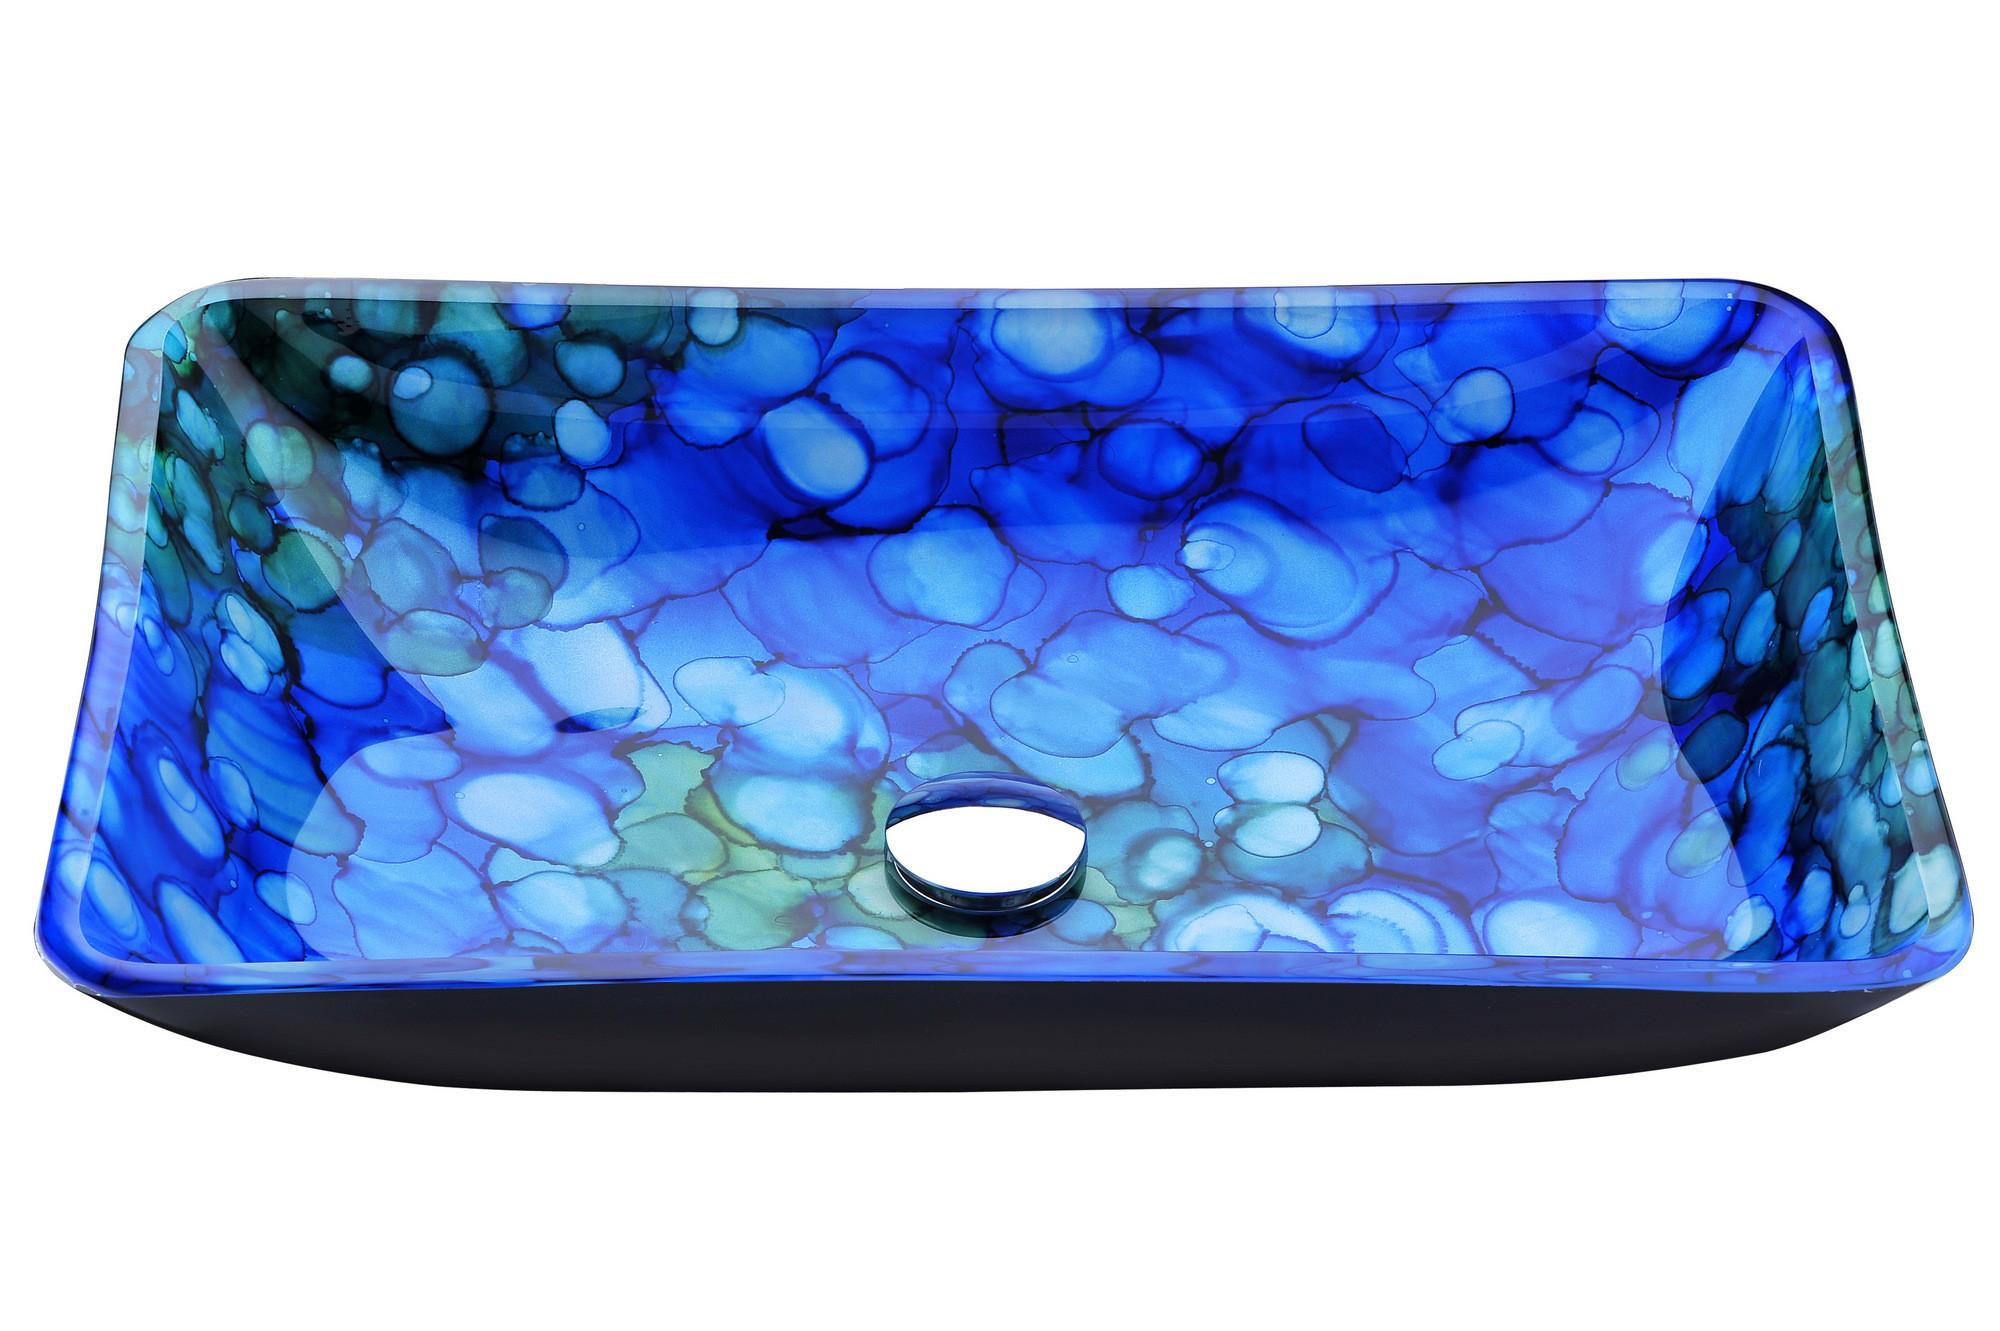 ANZZI LS-AZ040 Voce Series Deco-Glass Vessel Sink In Lustrous Blue